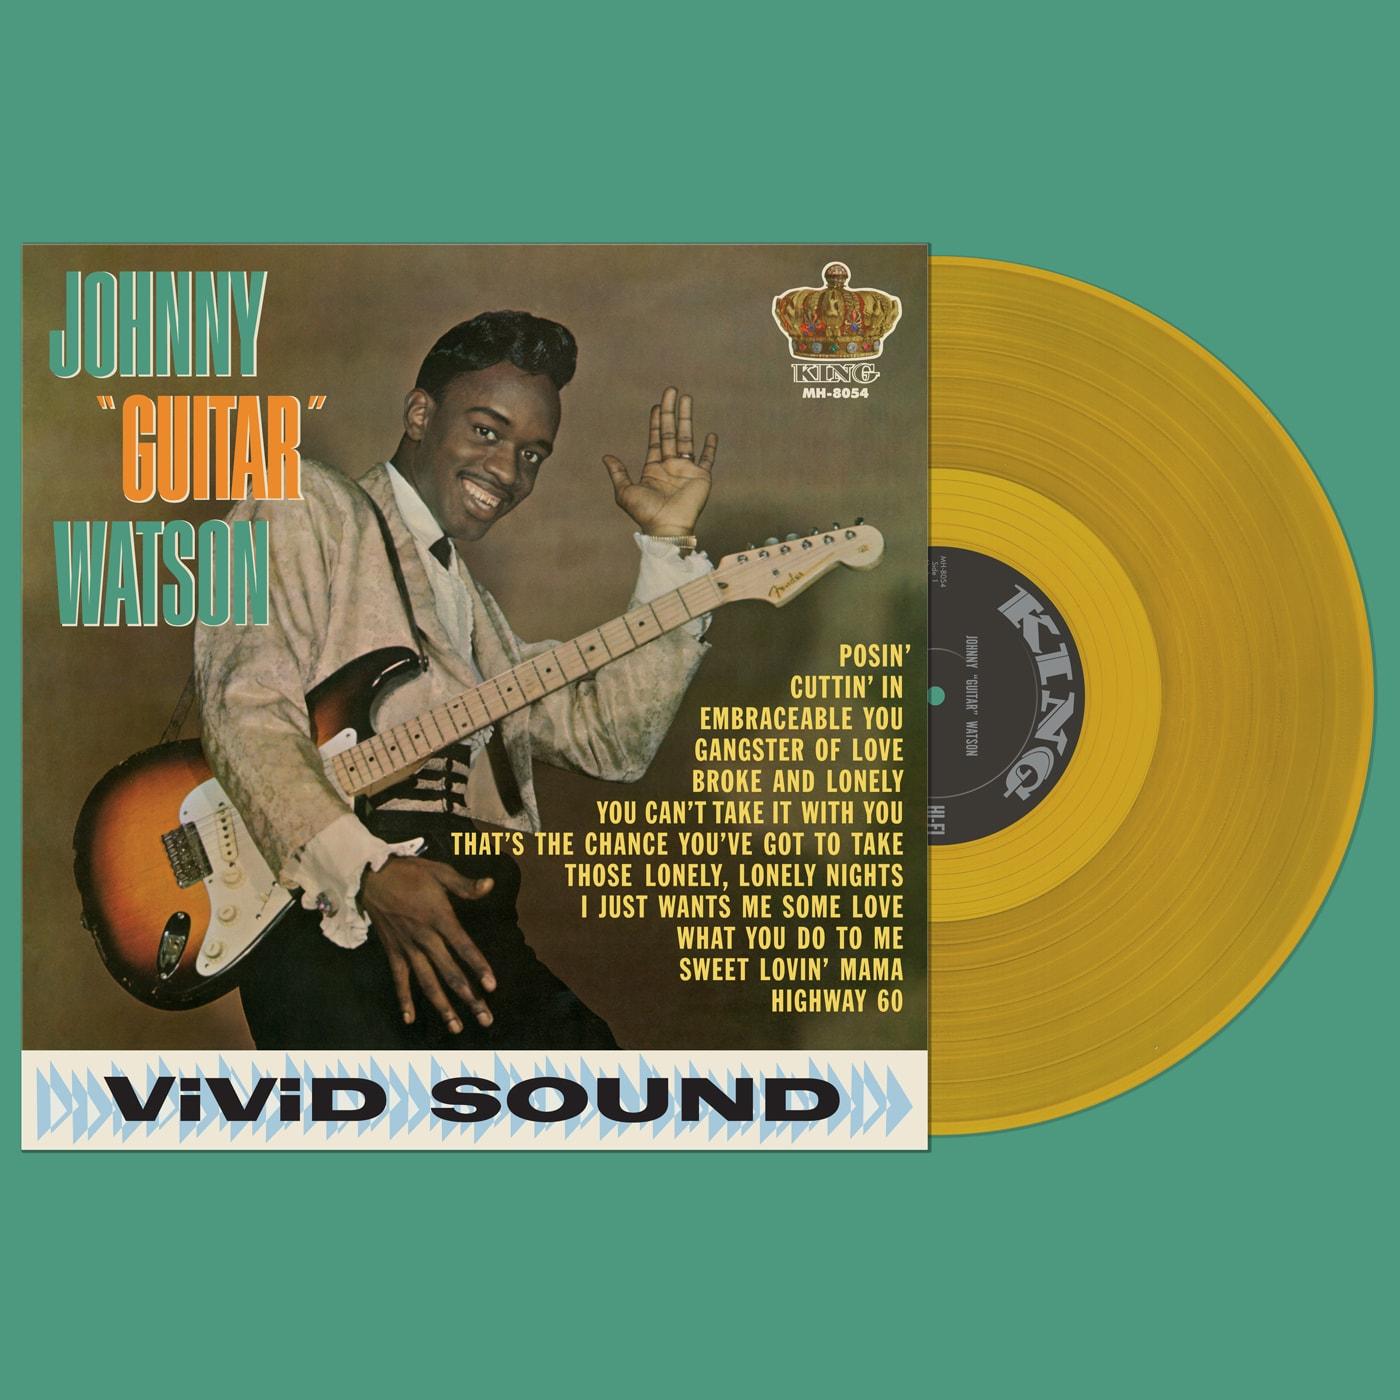 Watson, Johnny 'Guitar' - Johnny 'Guitar' Watson - LP